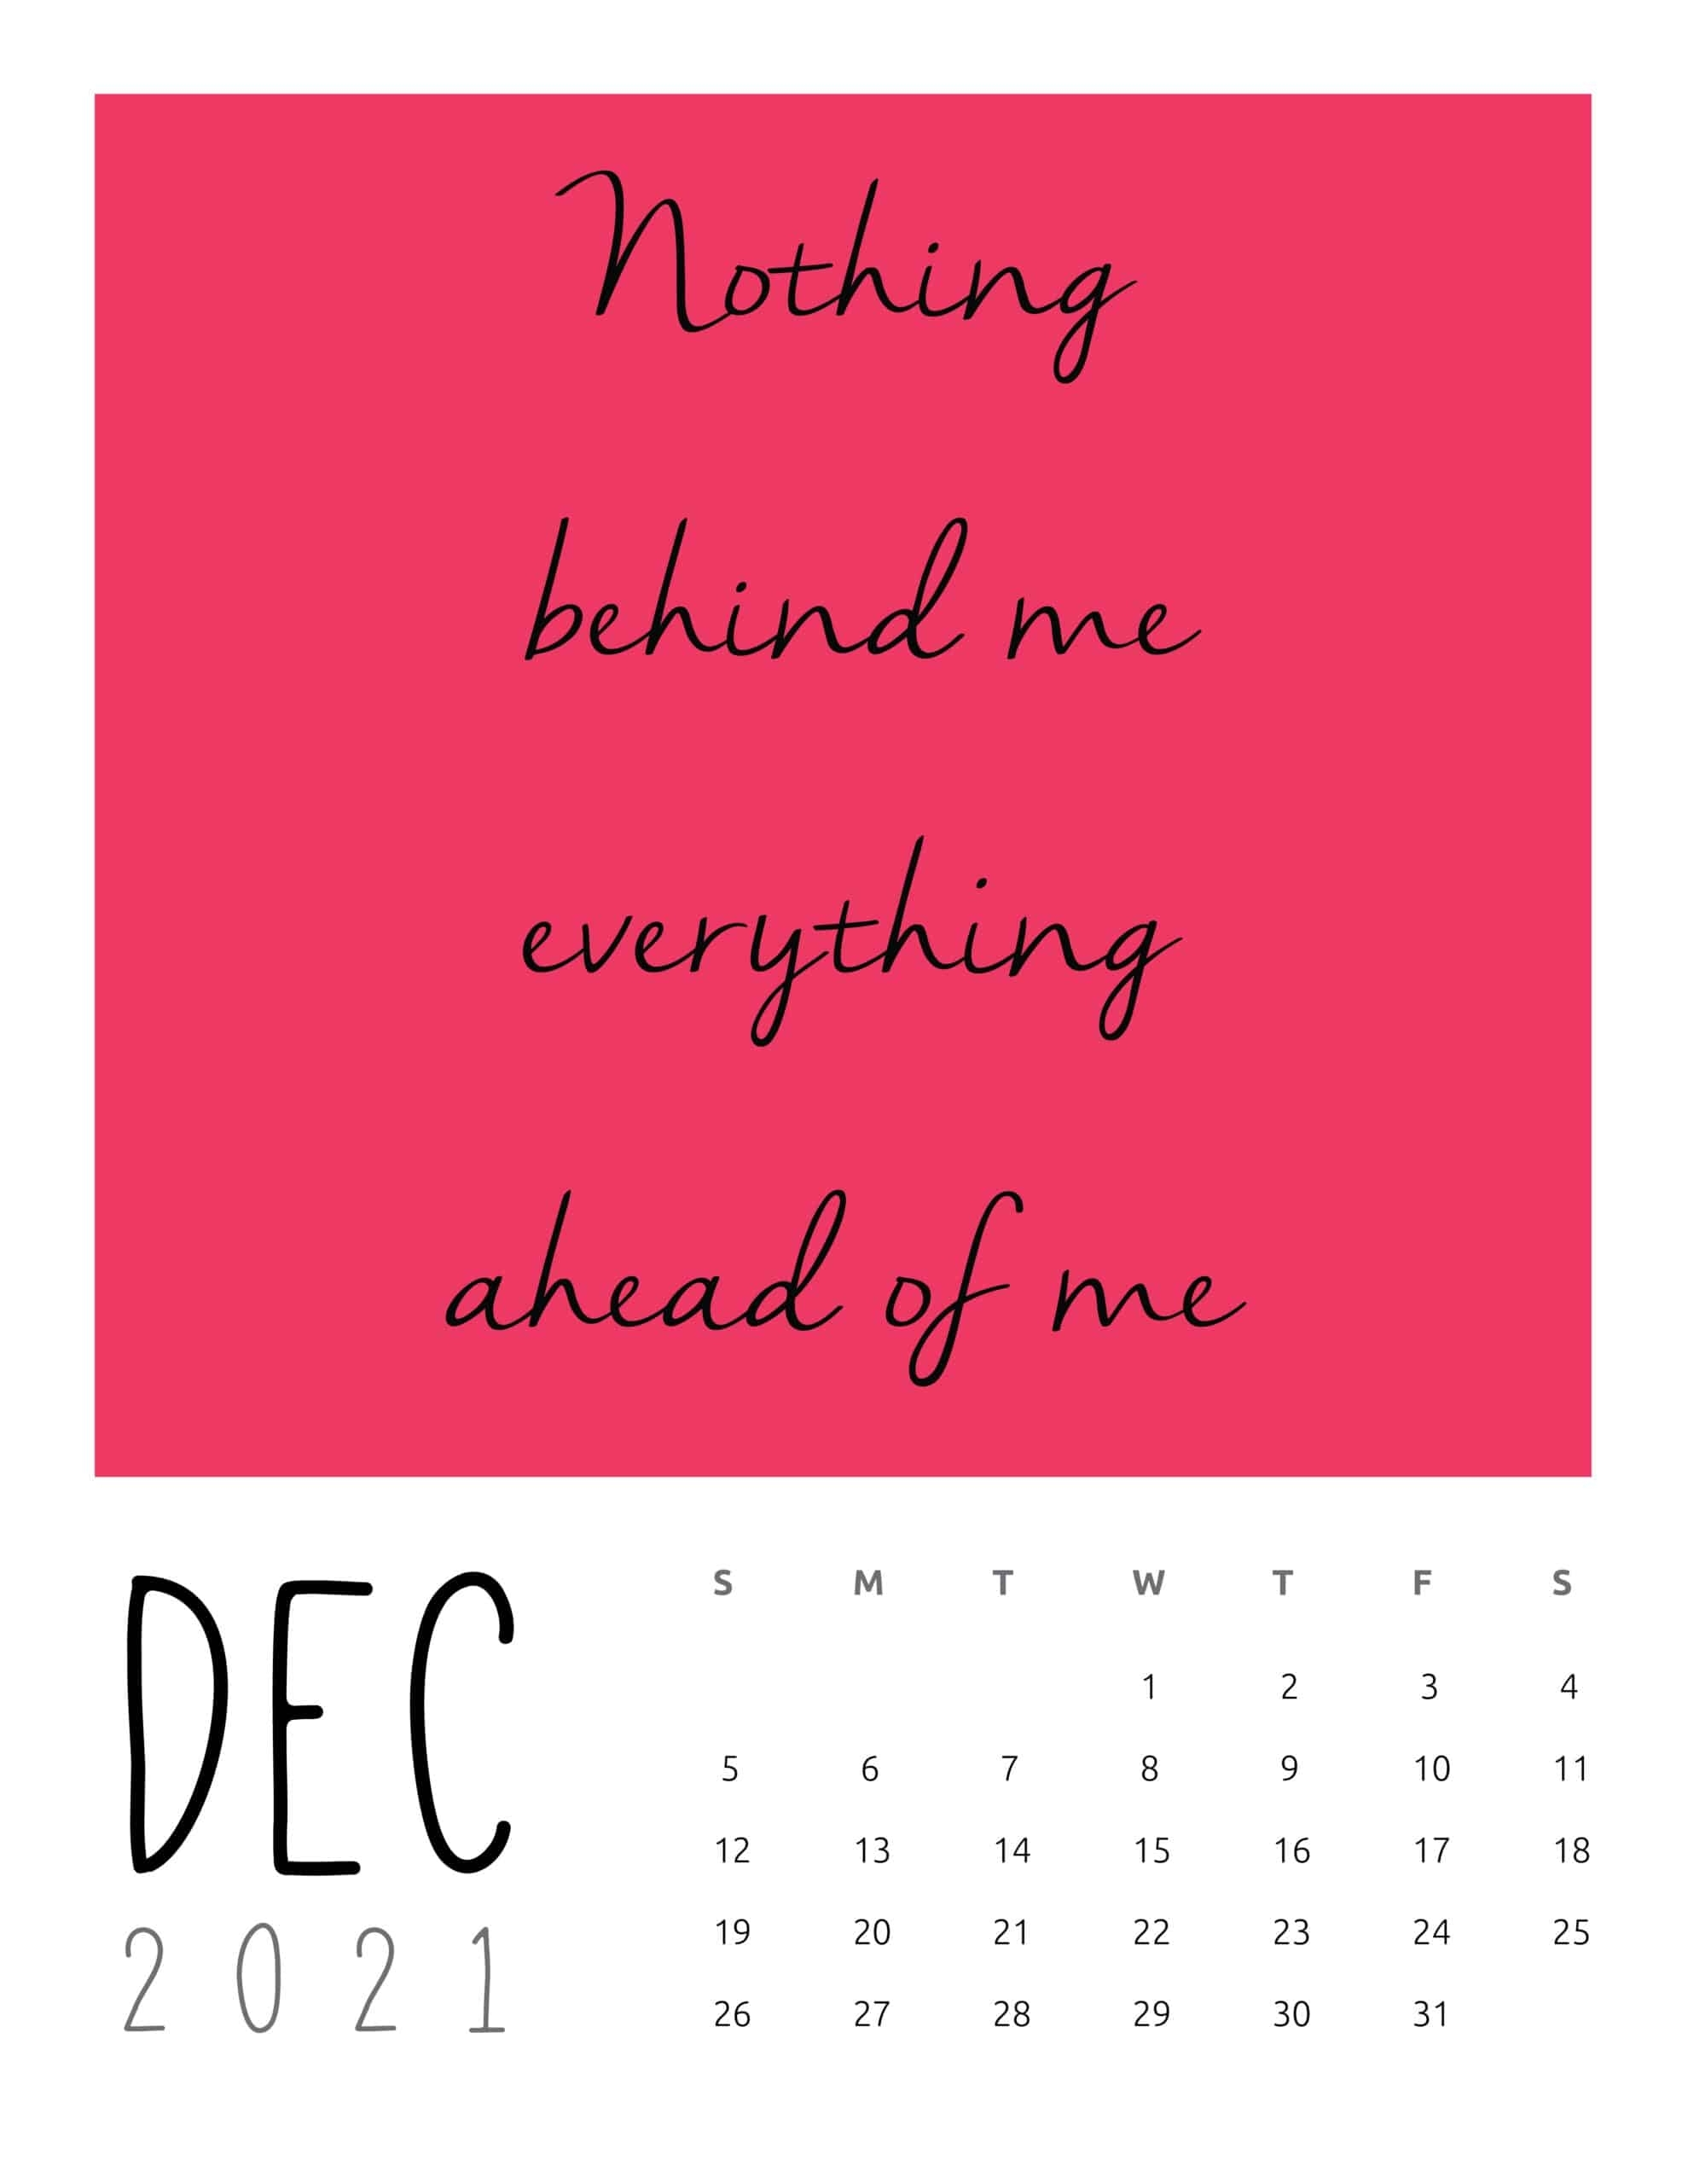 2021 Inspirational Quotes Calendar - World Of Printables